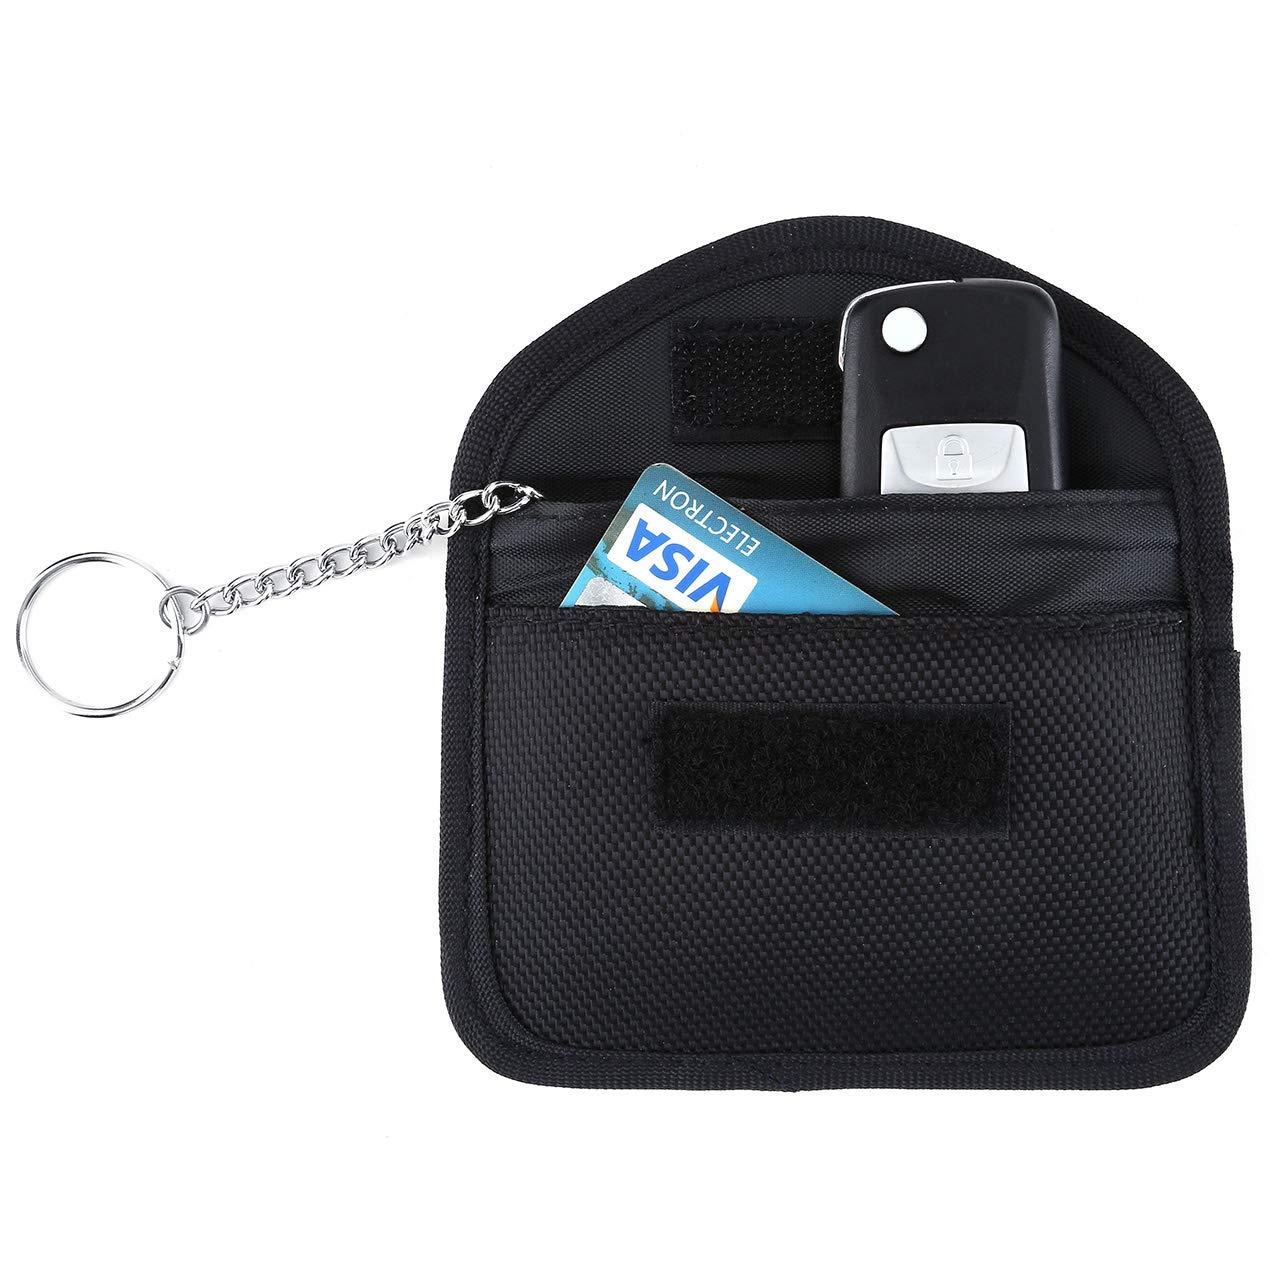 Long Size - Black ACBunji Faraday Bag Car Key FOB Signal Blocker Case Keyfob RFID Signals Shielding Pouch Cage Wallet Antitheft Lock Devices Privacy Protection